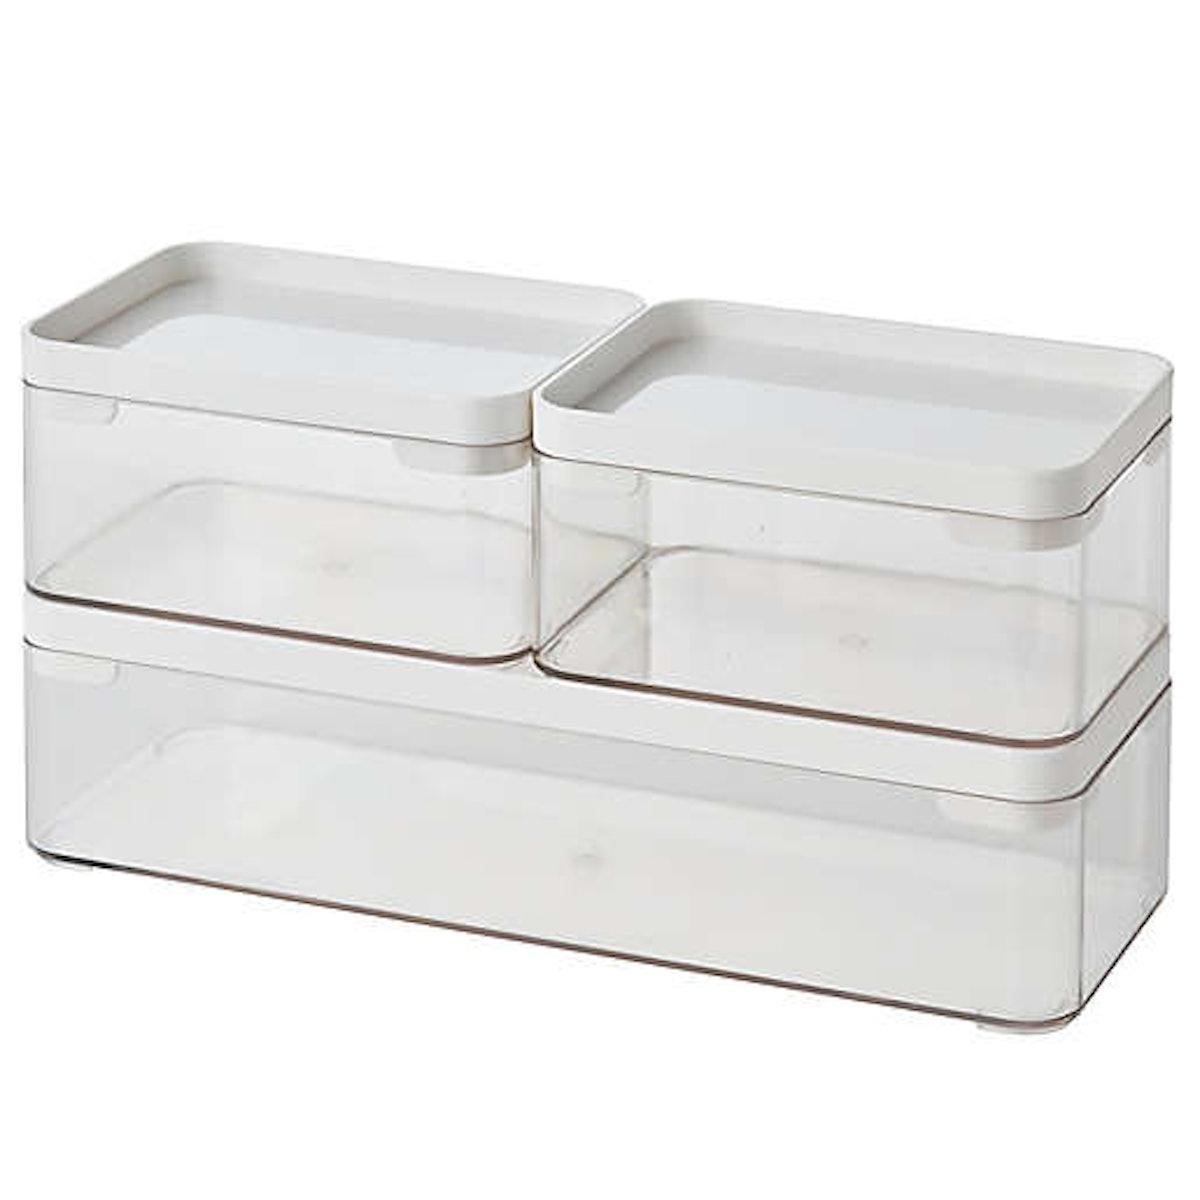 Simply Essential Stackable Bath Storage Bins (Set of 3)